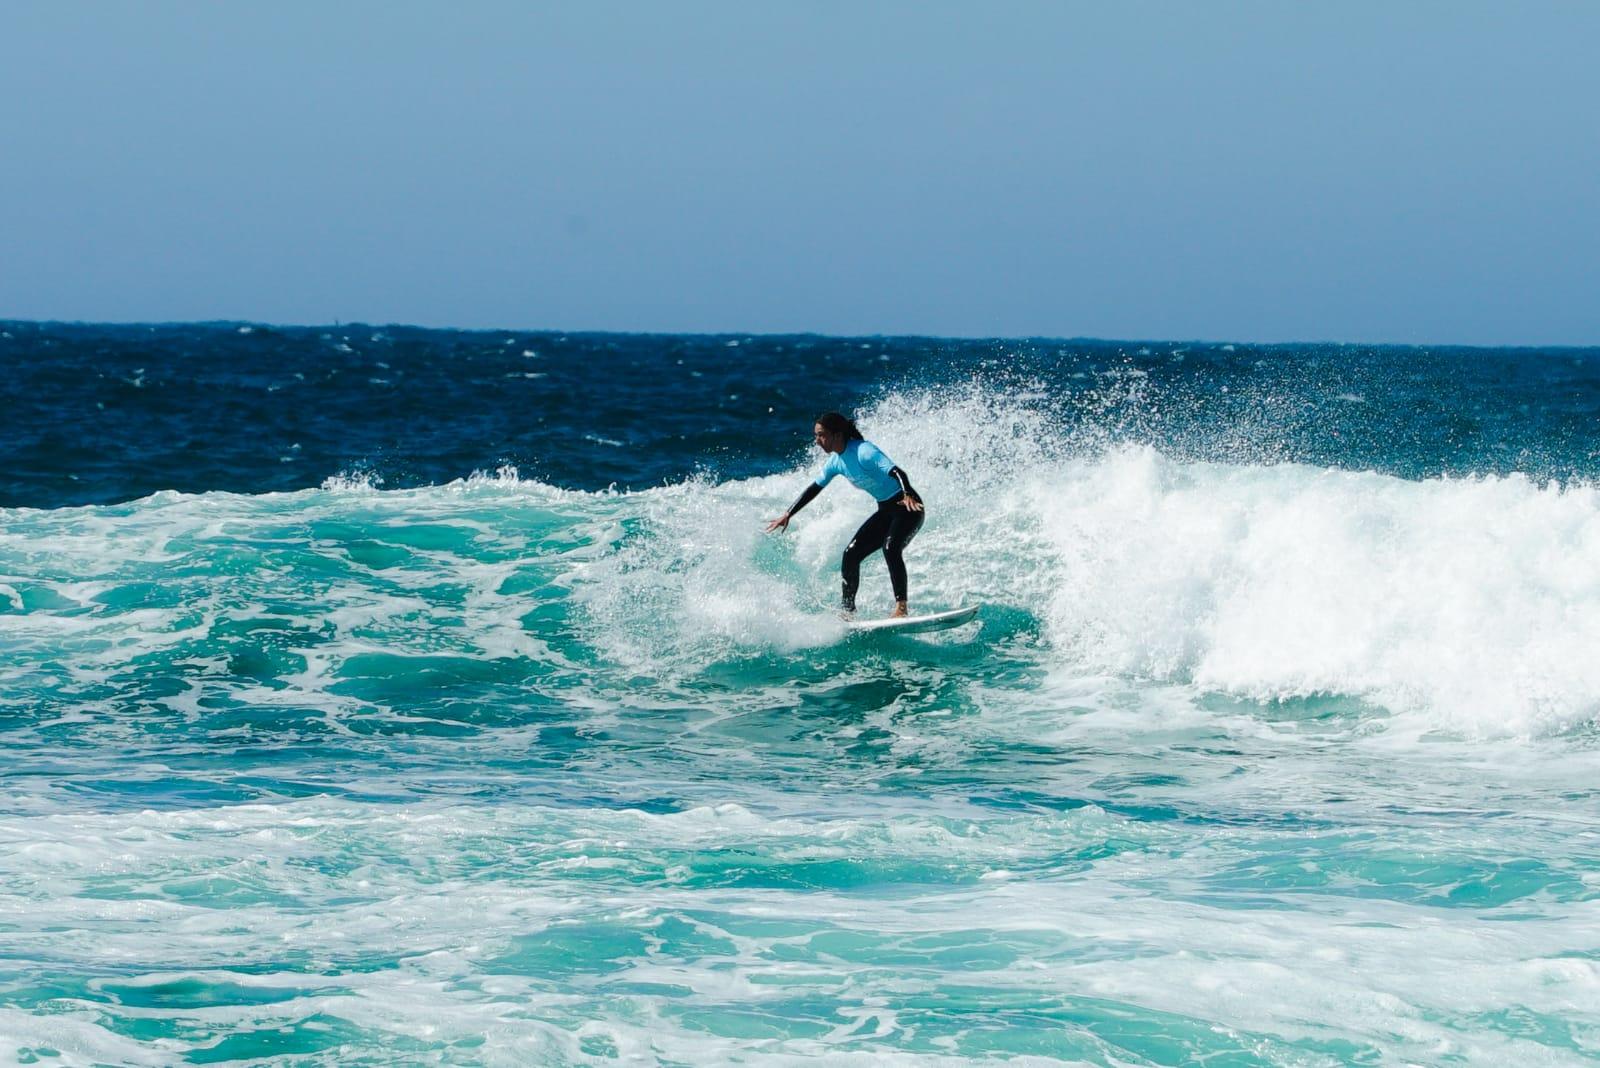 Proyecto de excelencia de surf